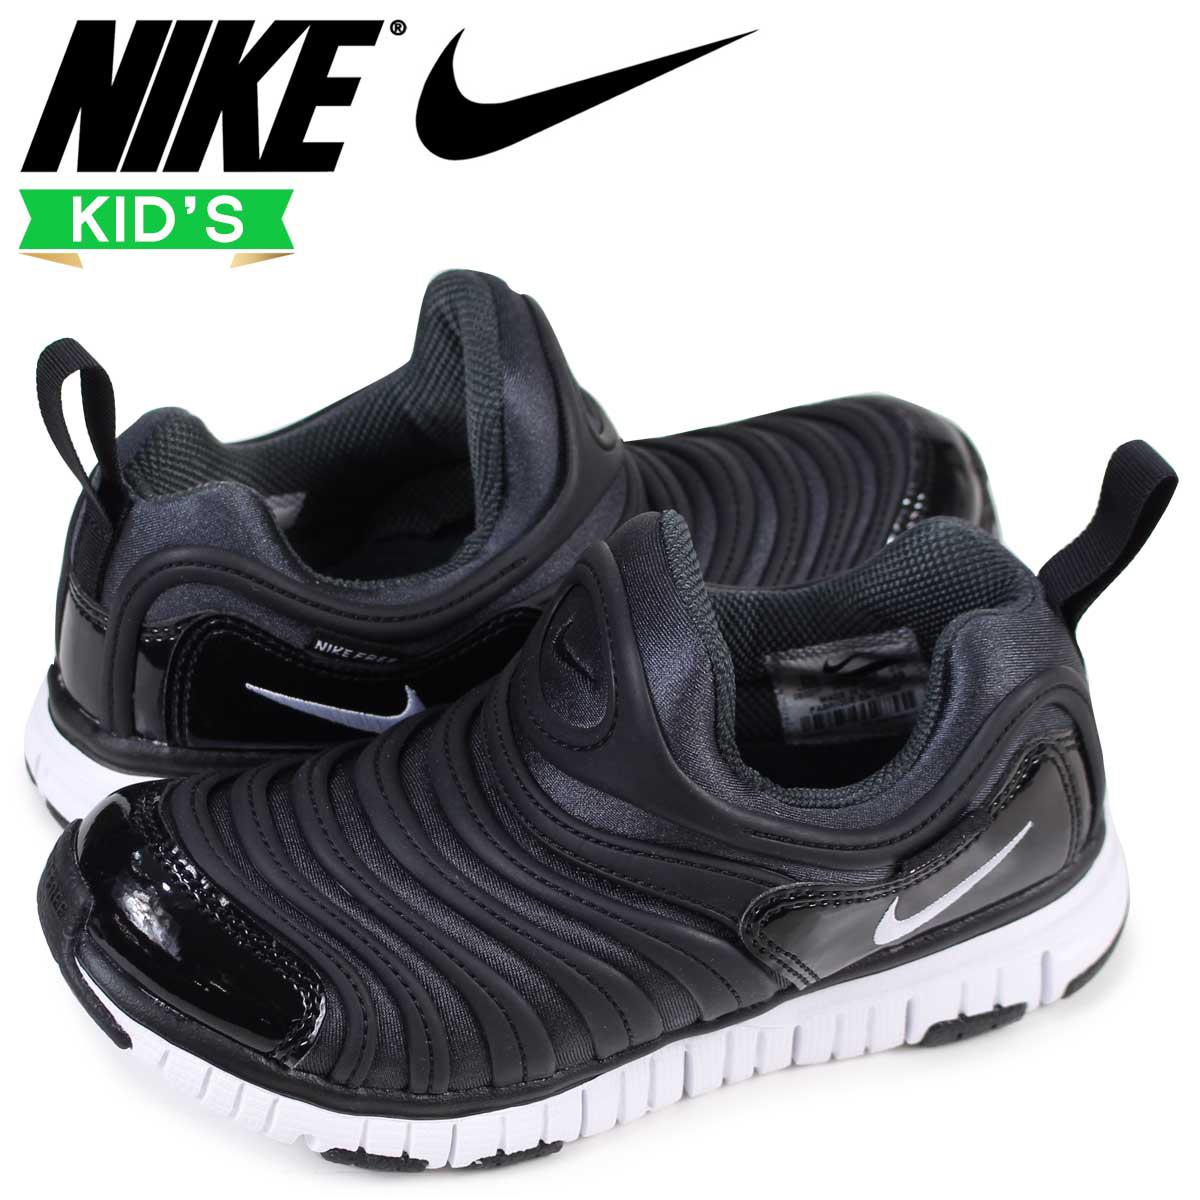 sneak online shop nike nike dynamo free kids sneakers dynamo free ps 343 738 013 black 1 26. Black Bedroom Furniture Sets. Home Design Ideas